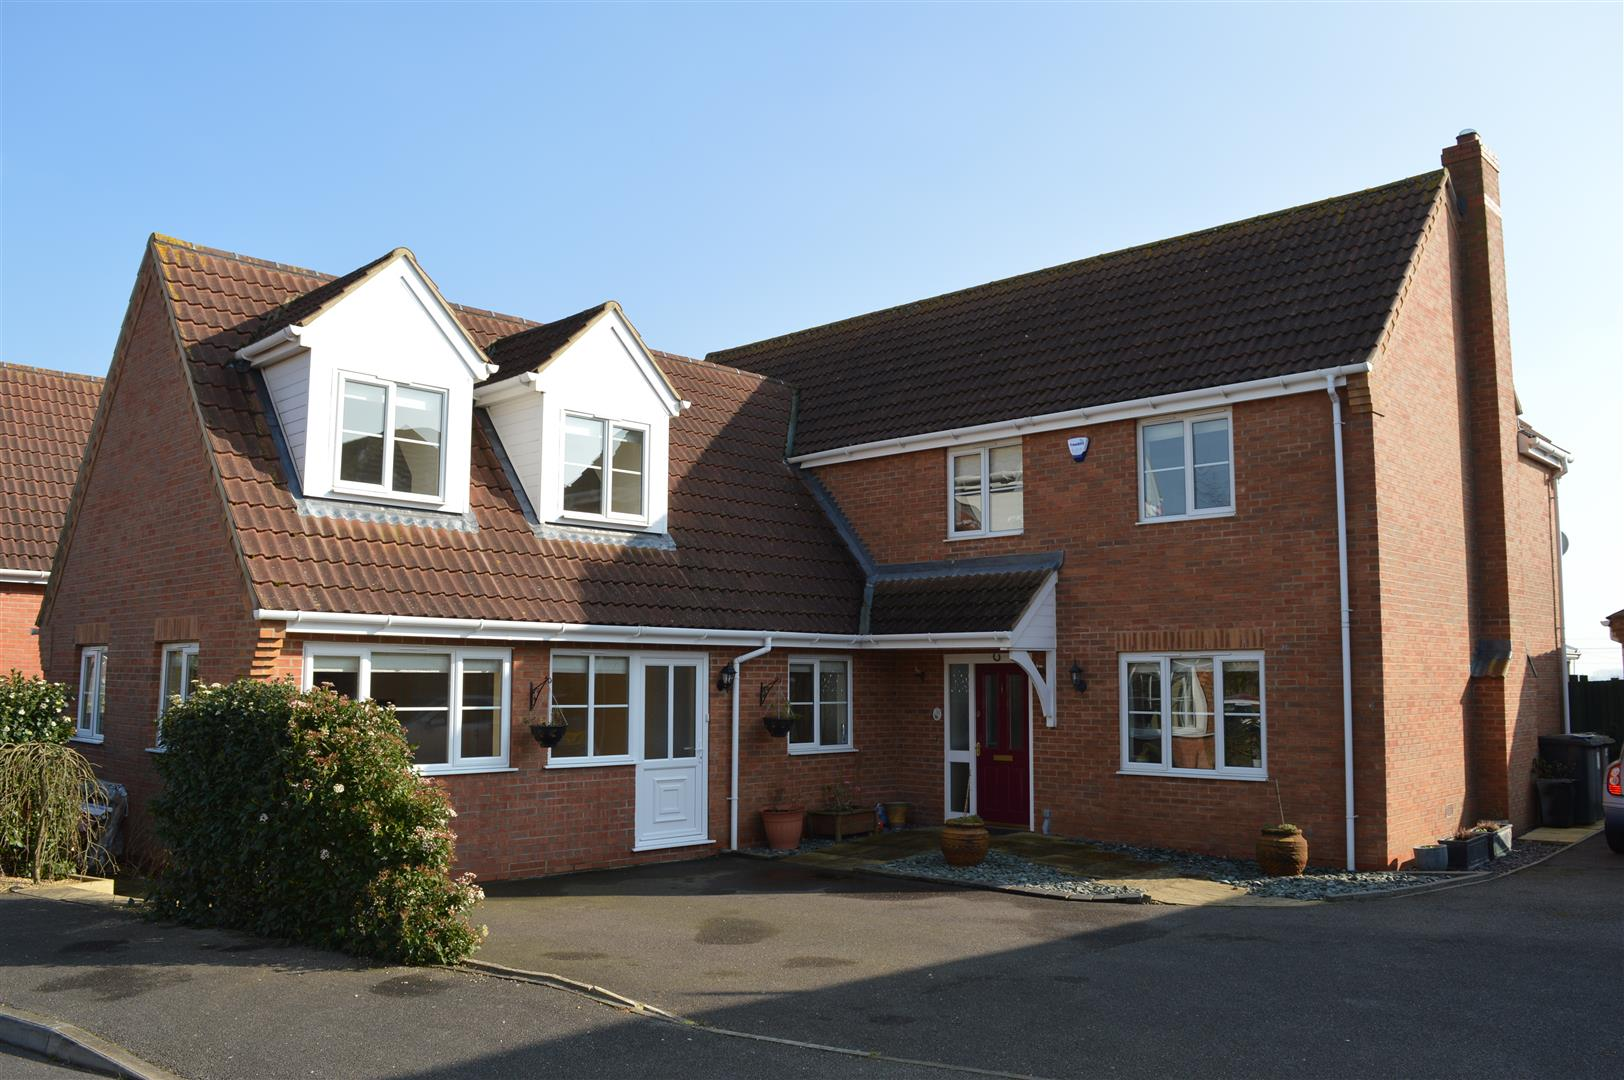 5 bedroom property in Ruskington